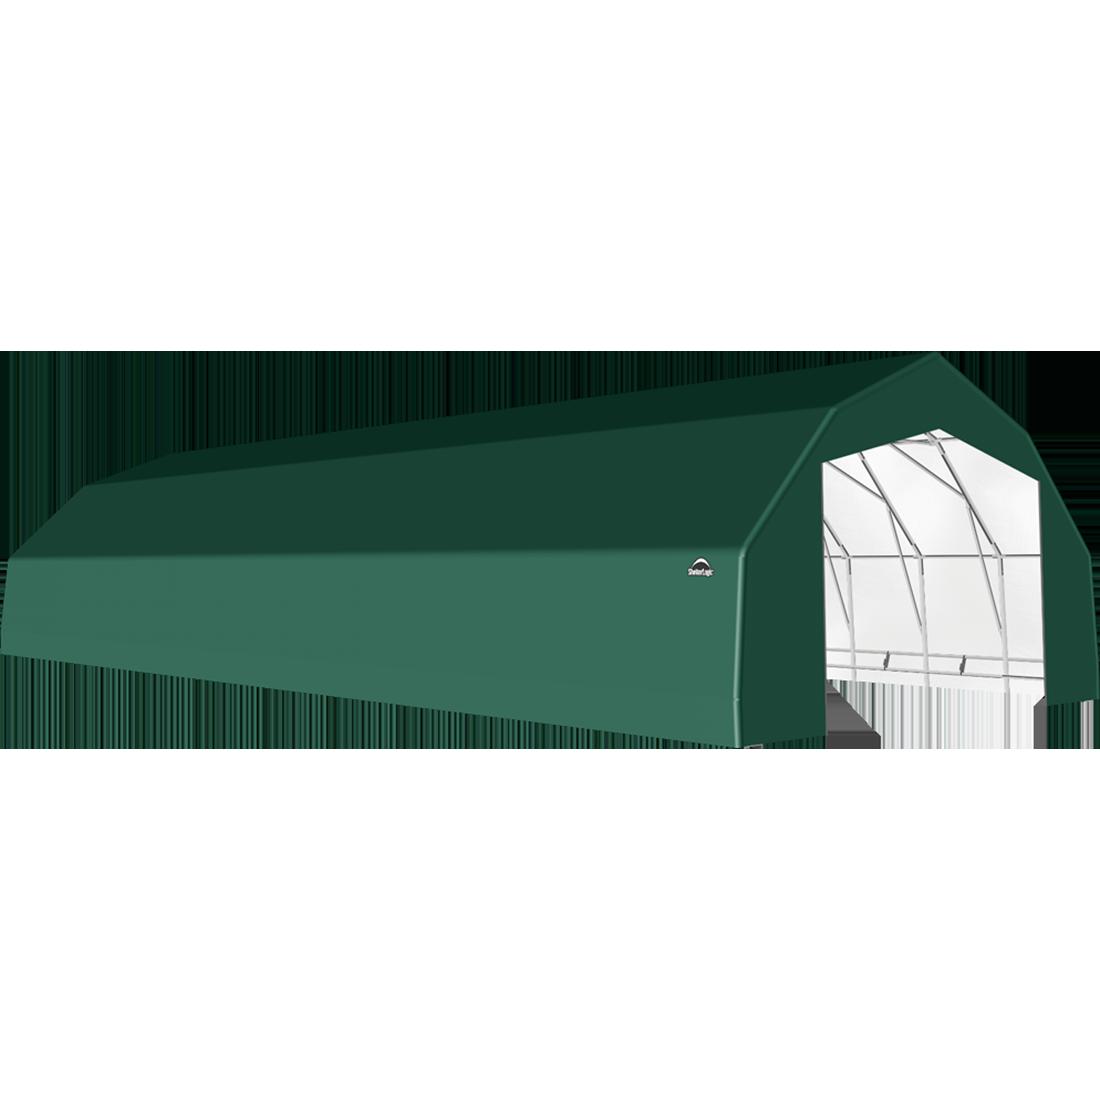 ShelterTech SP Series Barn Shelter, 25 ft. x 60 ft. x 14 ft. Heavy Duty PVC 14.5 oz. Green